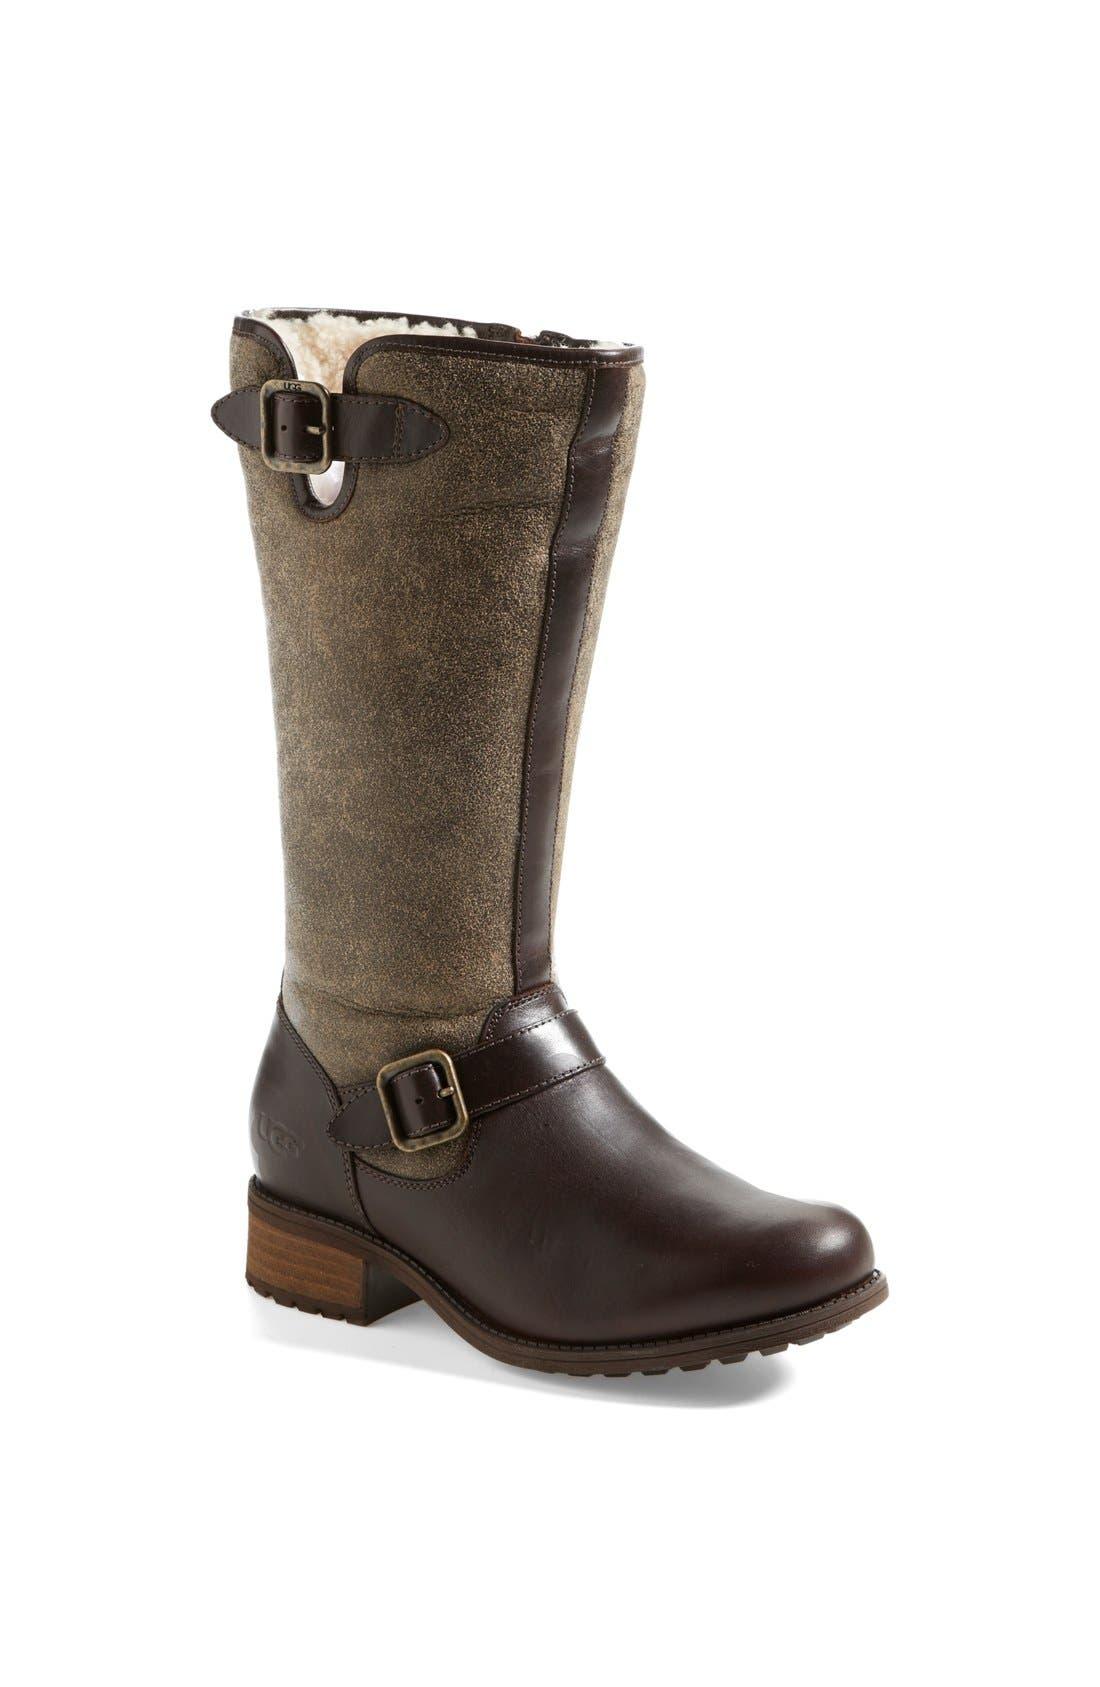 Main Image - UGG® 'Chancery' Boot (Women)